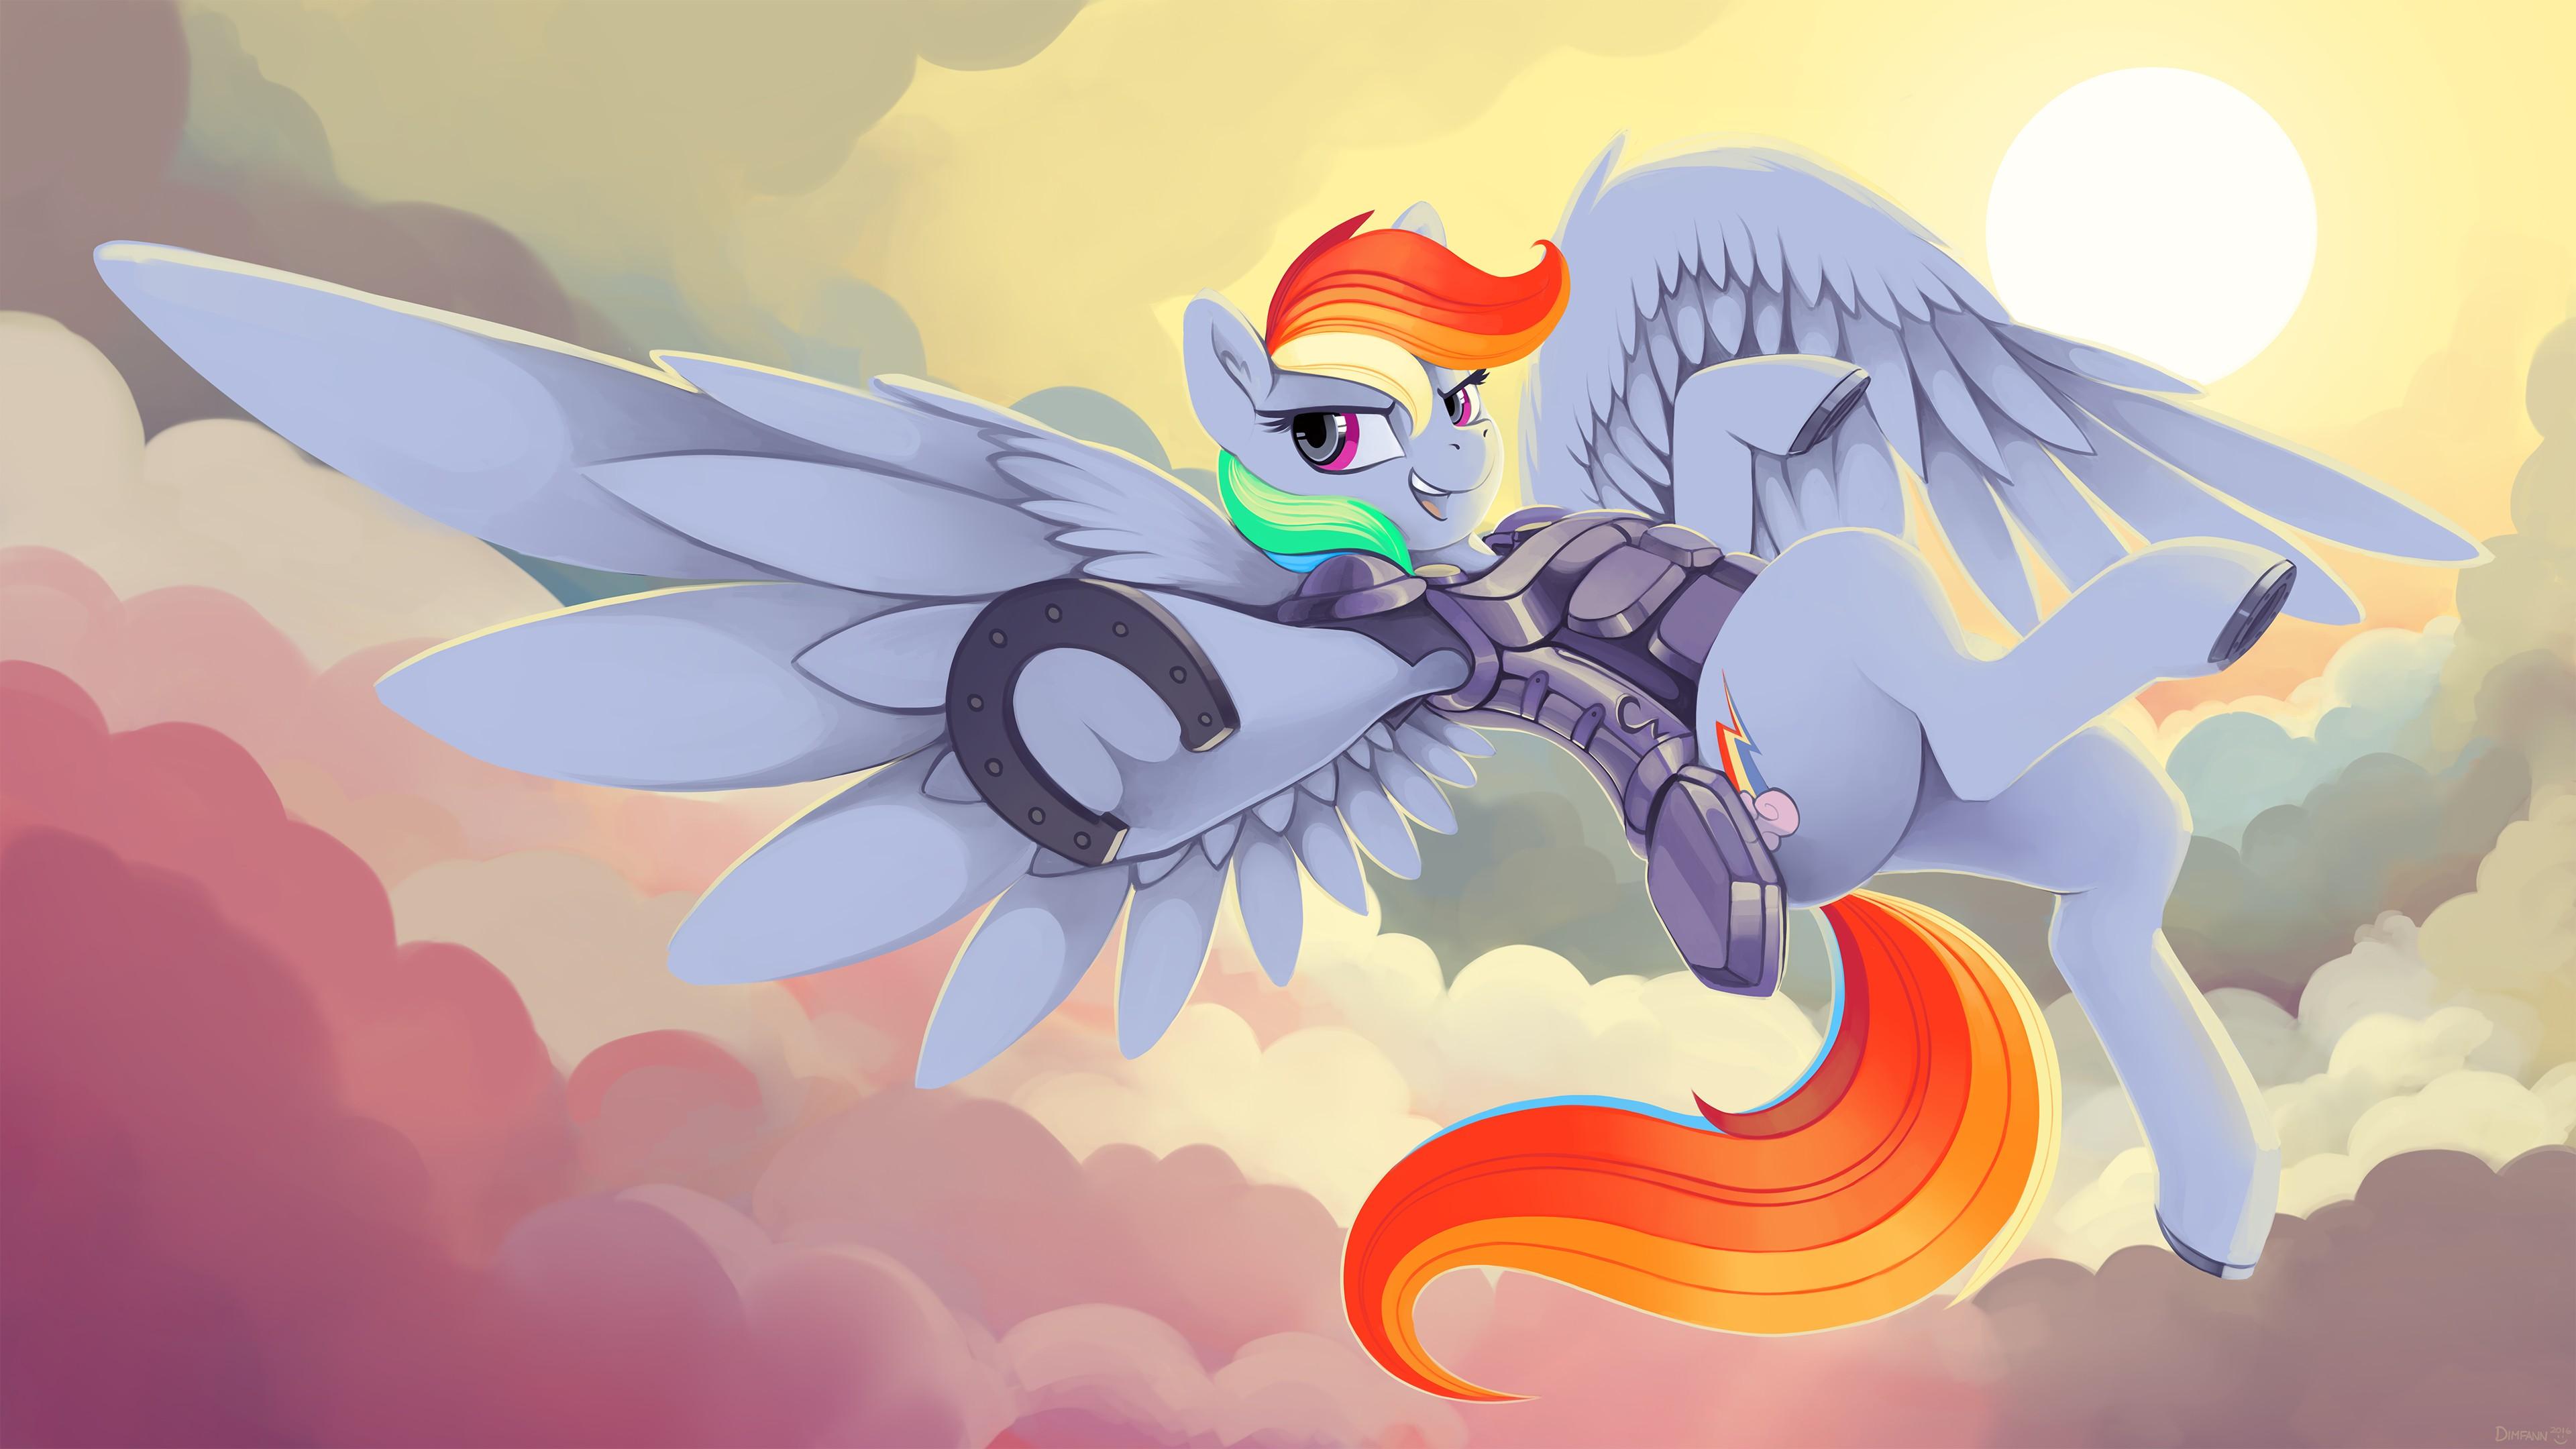 Wallpaper 3840x2160 Px Armor Mlp Fim My Little Pony Rainbow